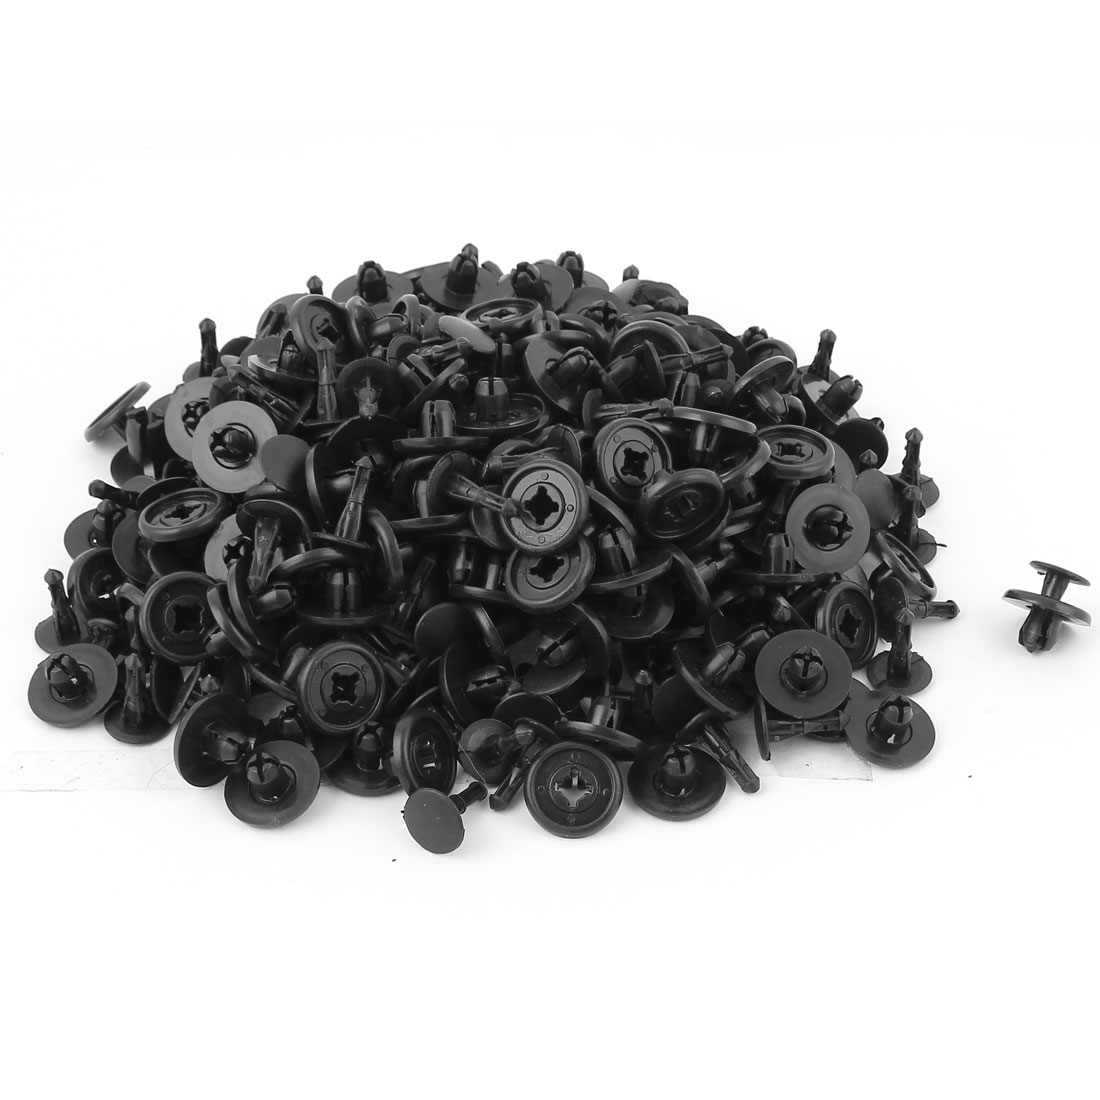 200 Pcs Black Plastic Rivet Trim Fastener Moulding Clips 7mm x 20mm x 12mm